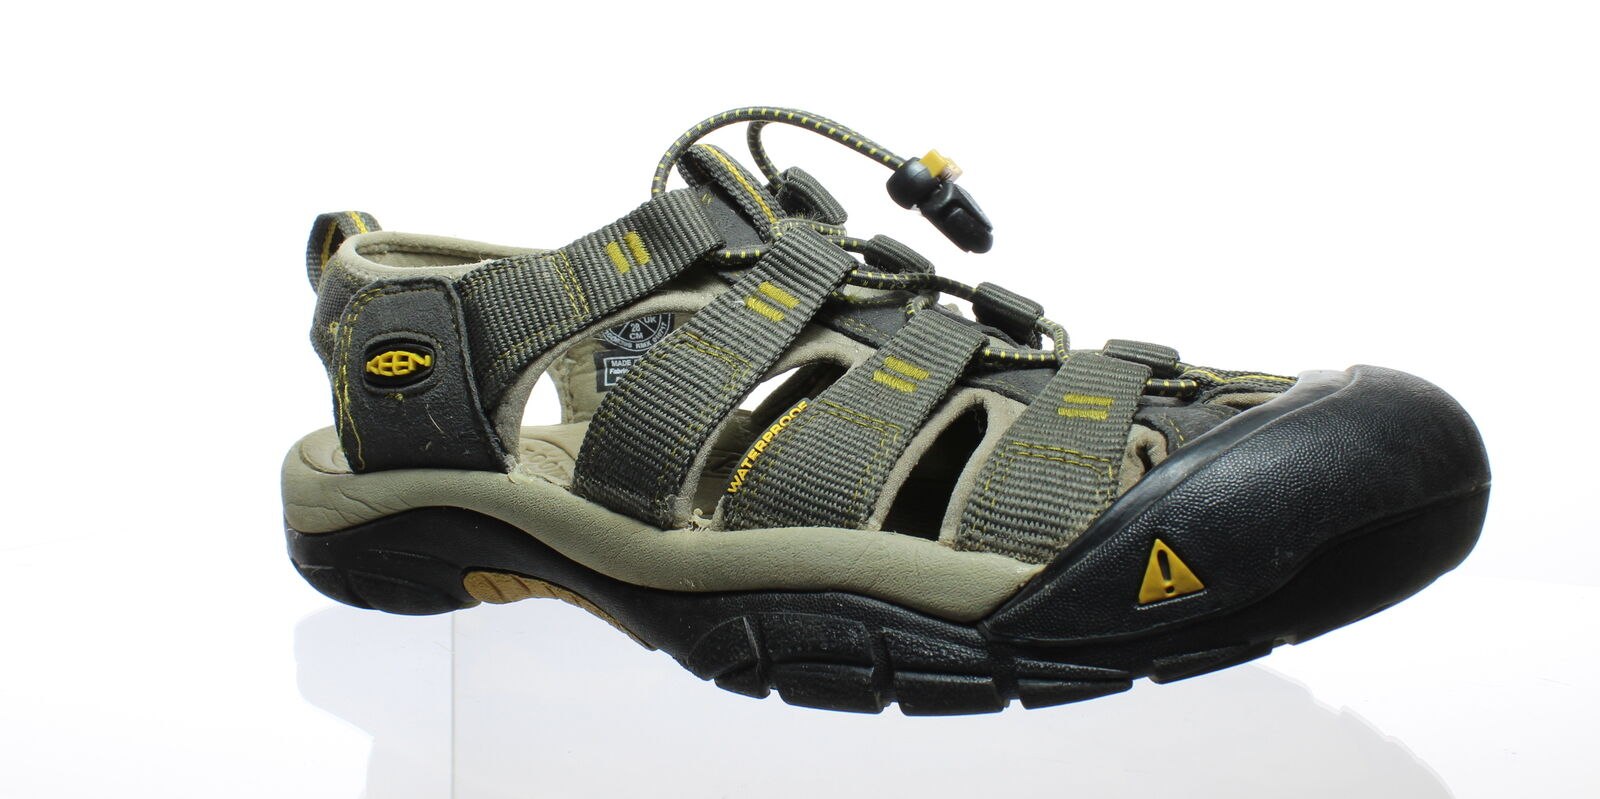 KEEN Uomo 1008399 Raven/Aluminum Sport Sandals Size 10 (55209) (55209) (55209) 6d9aa1